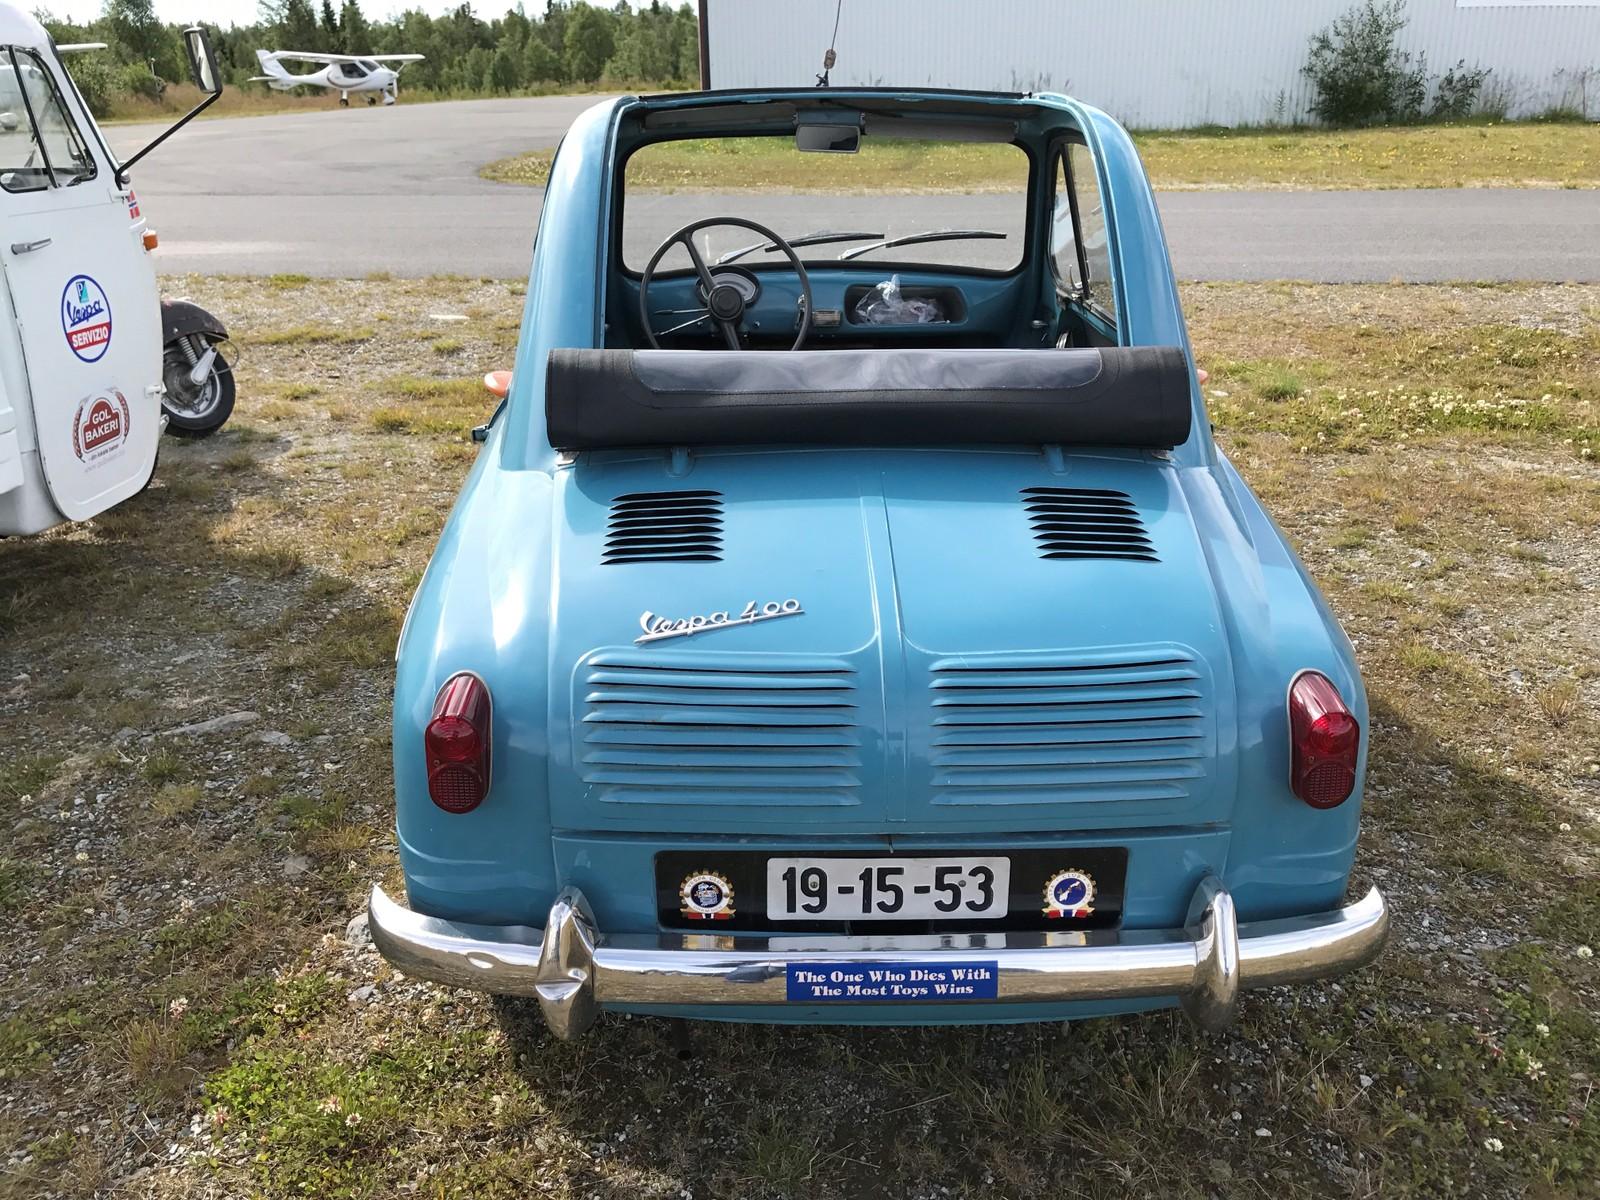 Landets eneste Vespa personbil var også å finne i Hallingdal.